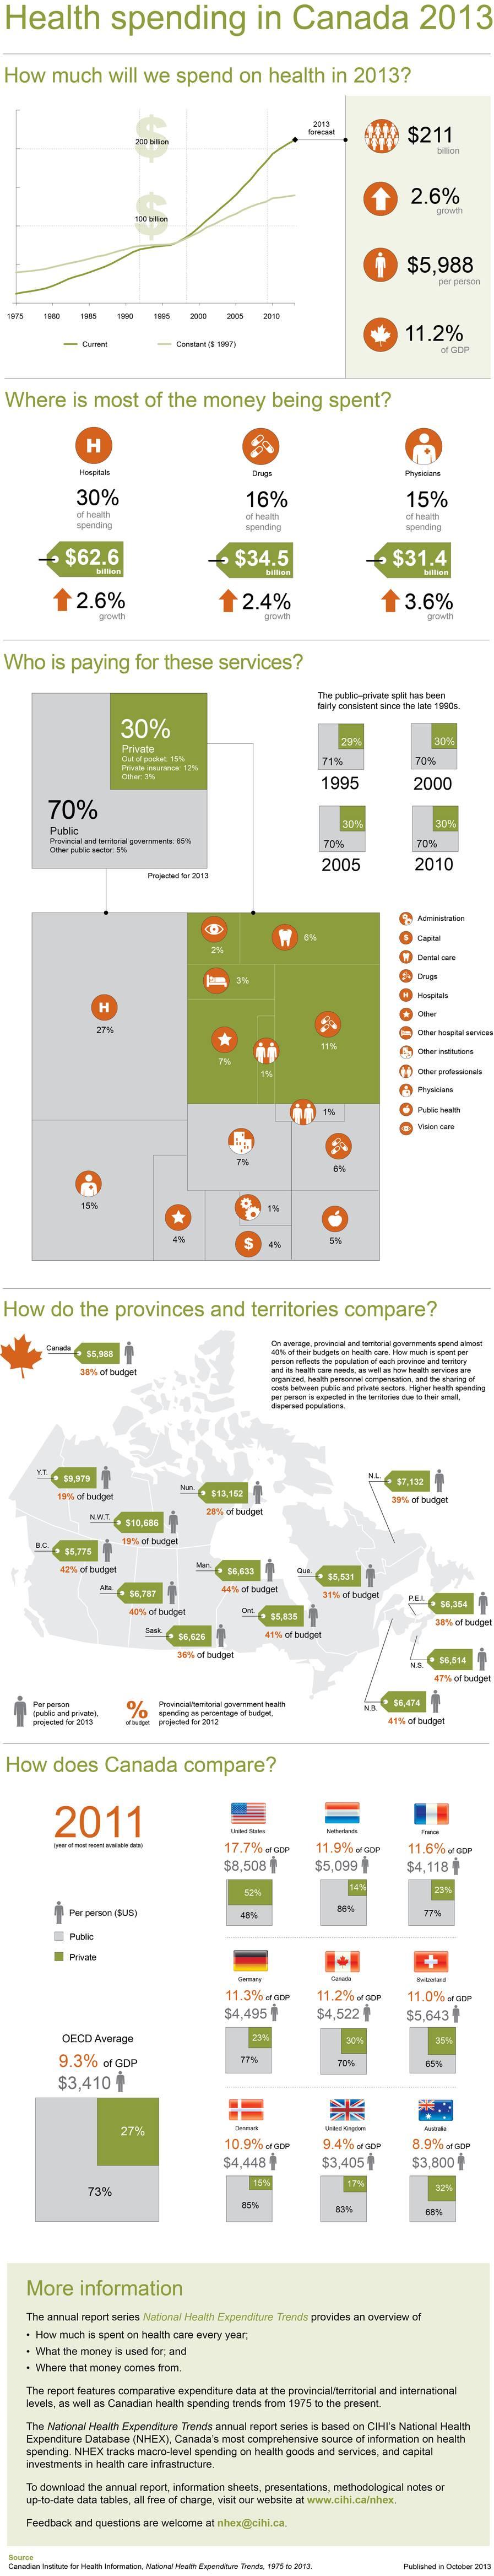 Health Care Spending in Canada. Health expenditure